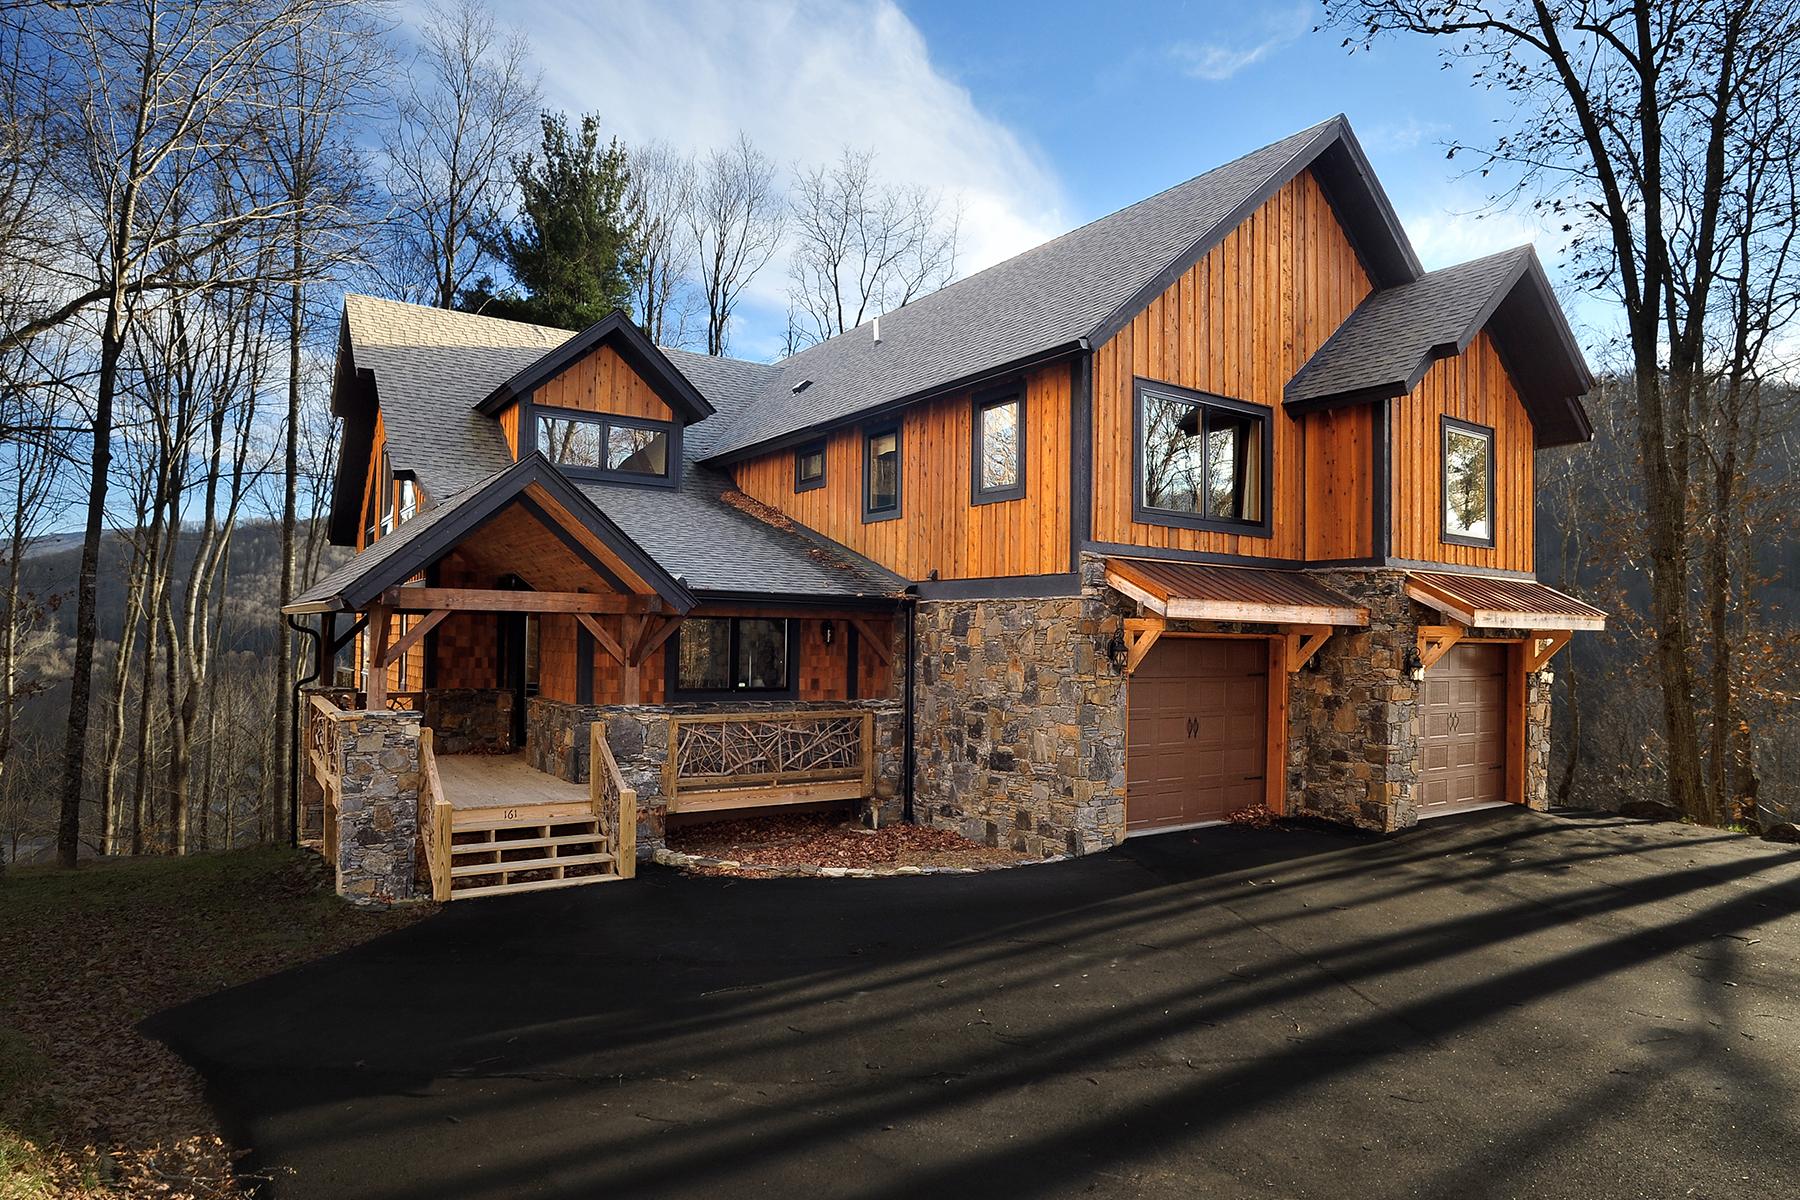 Condominium for Sale at BANNER ELK - LODGES AT EAGLES NEST 161 Humpview Trail B Banner Elk, North Carolina 28604 United States